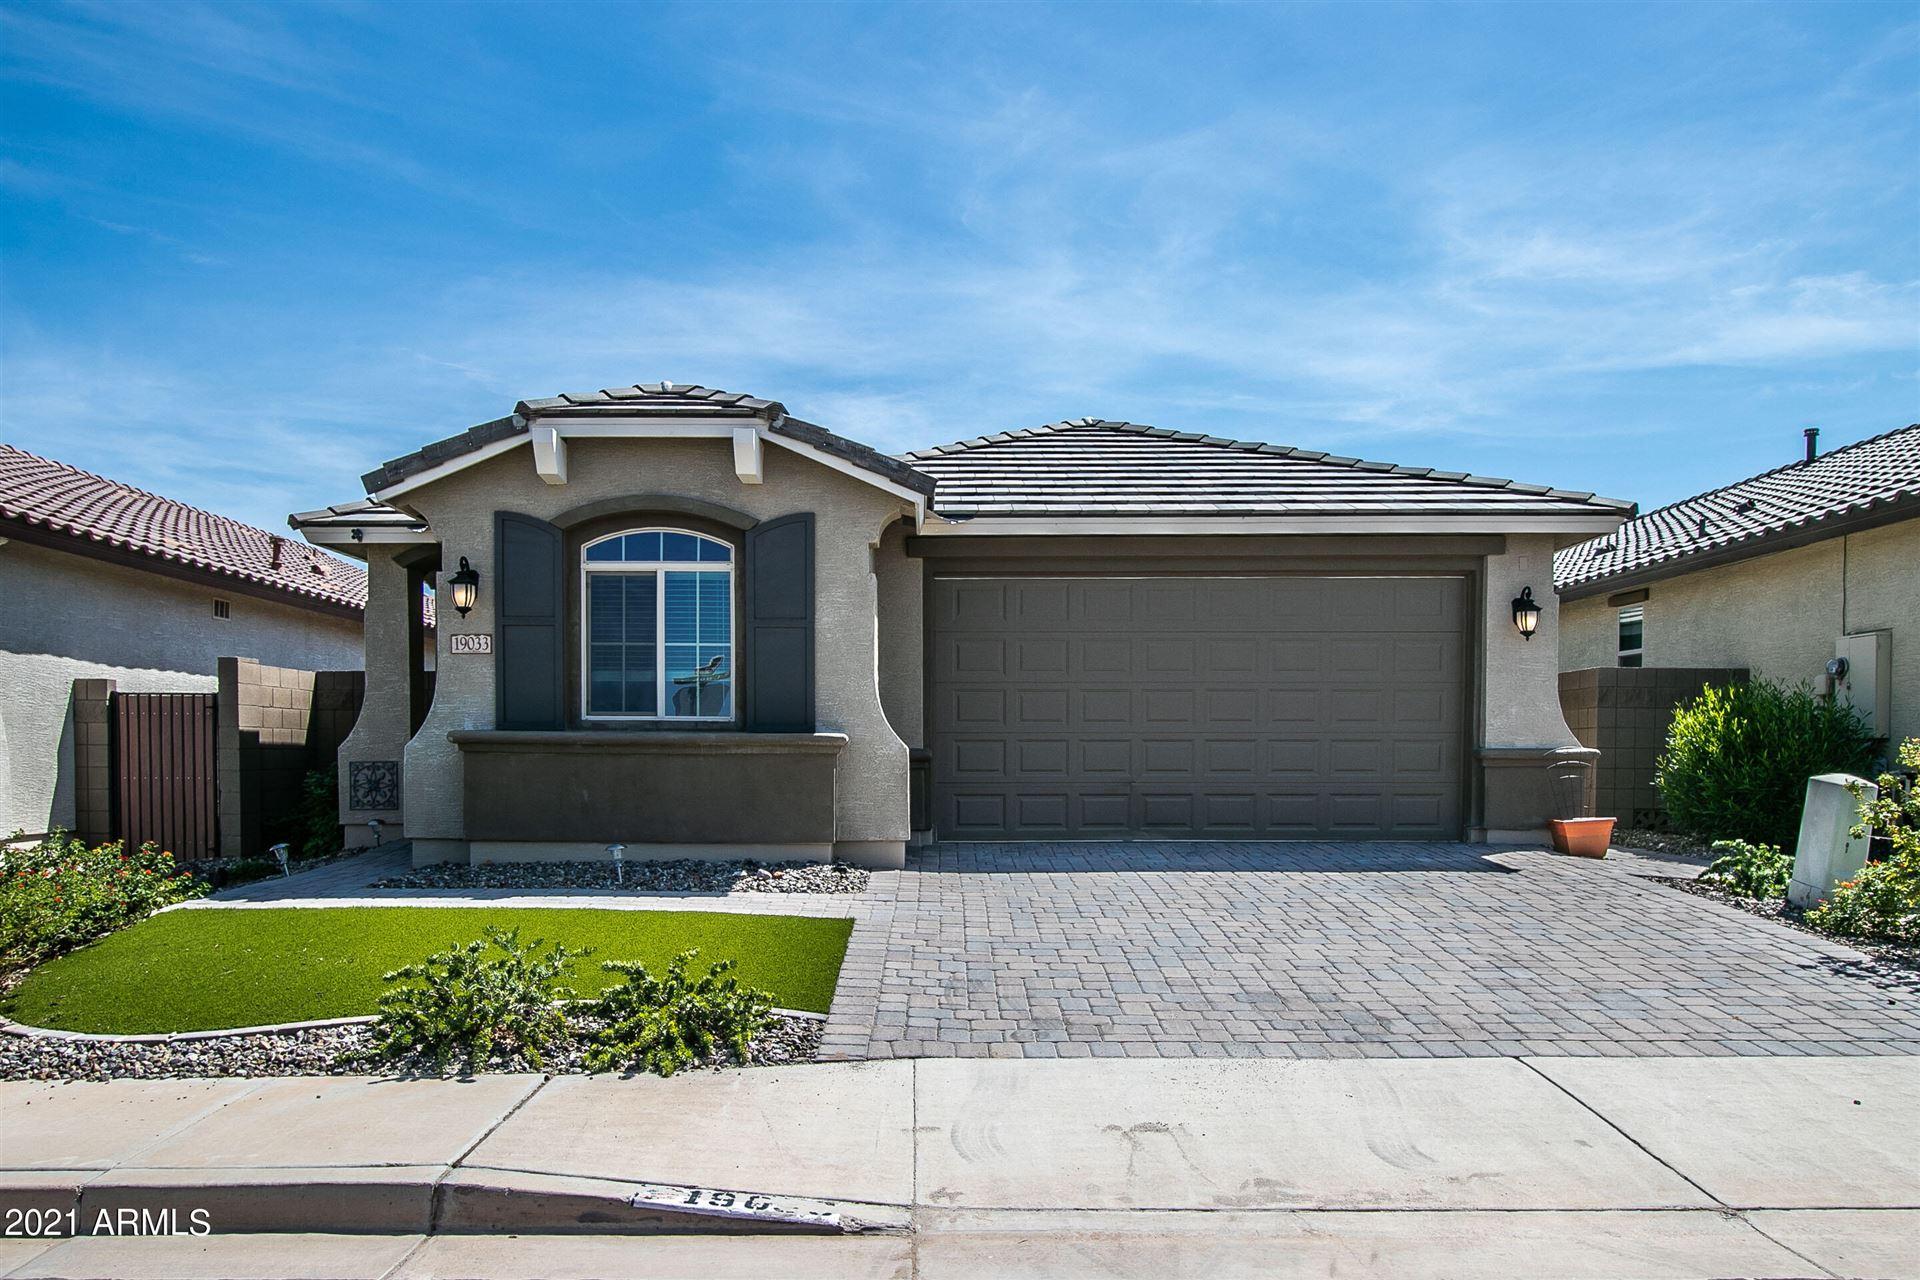 Photo for 19033 N Cook Drive, Maricopa, AZ 85138 (MLS # 6292188)